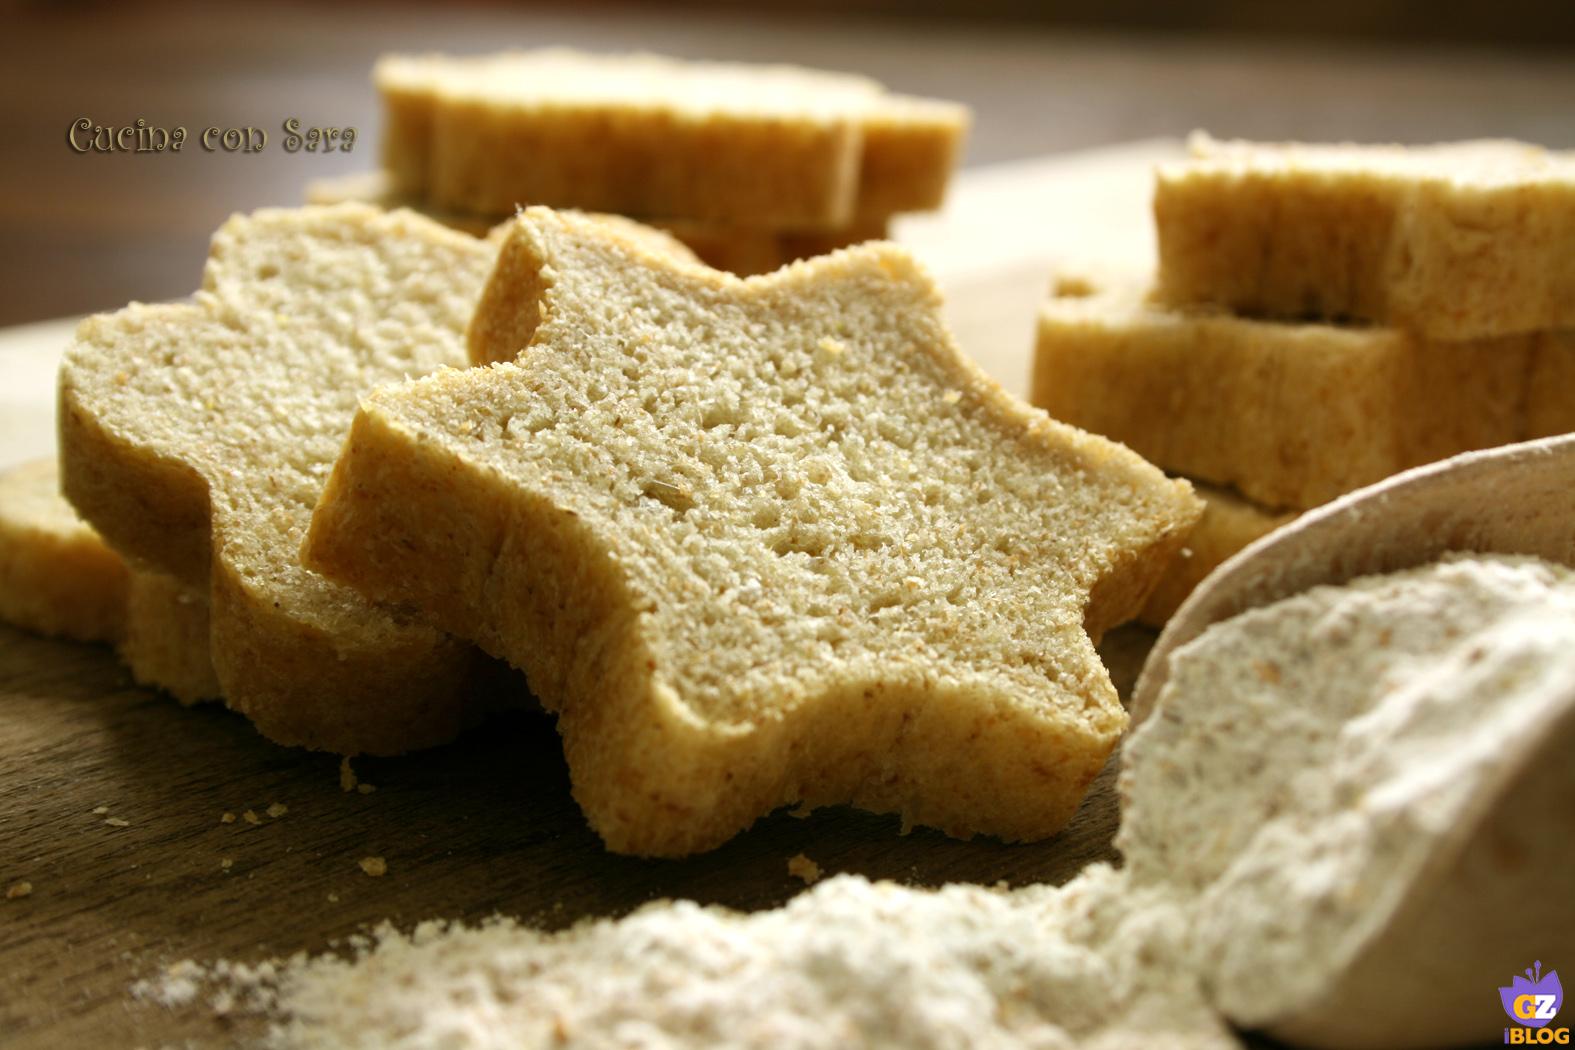 Pane integrale a forma di stella, cucina con sara